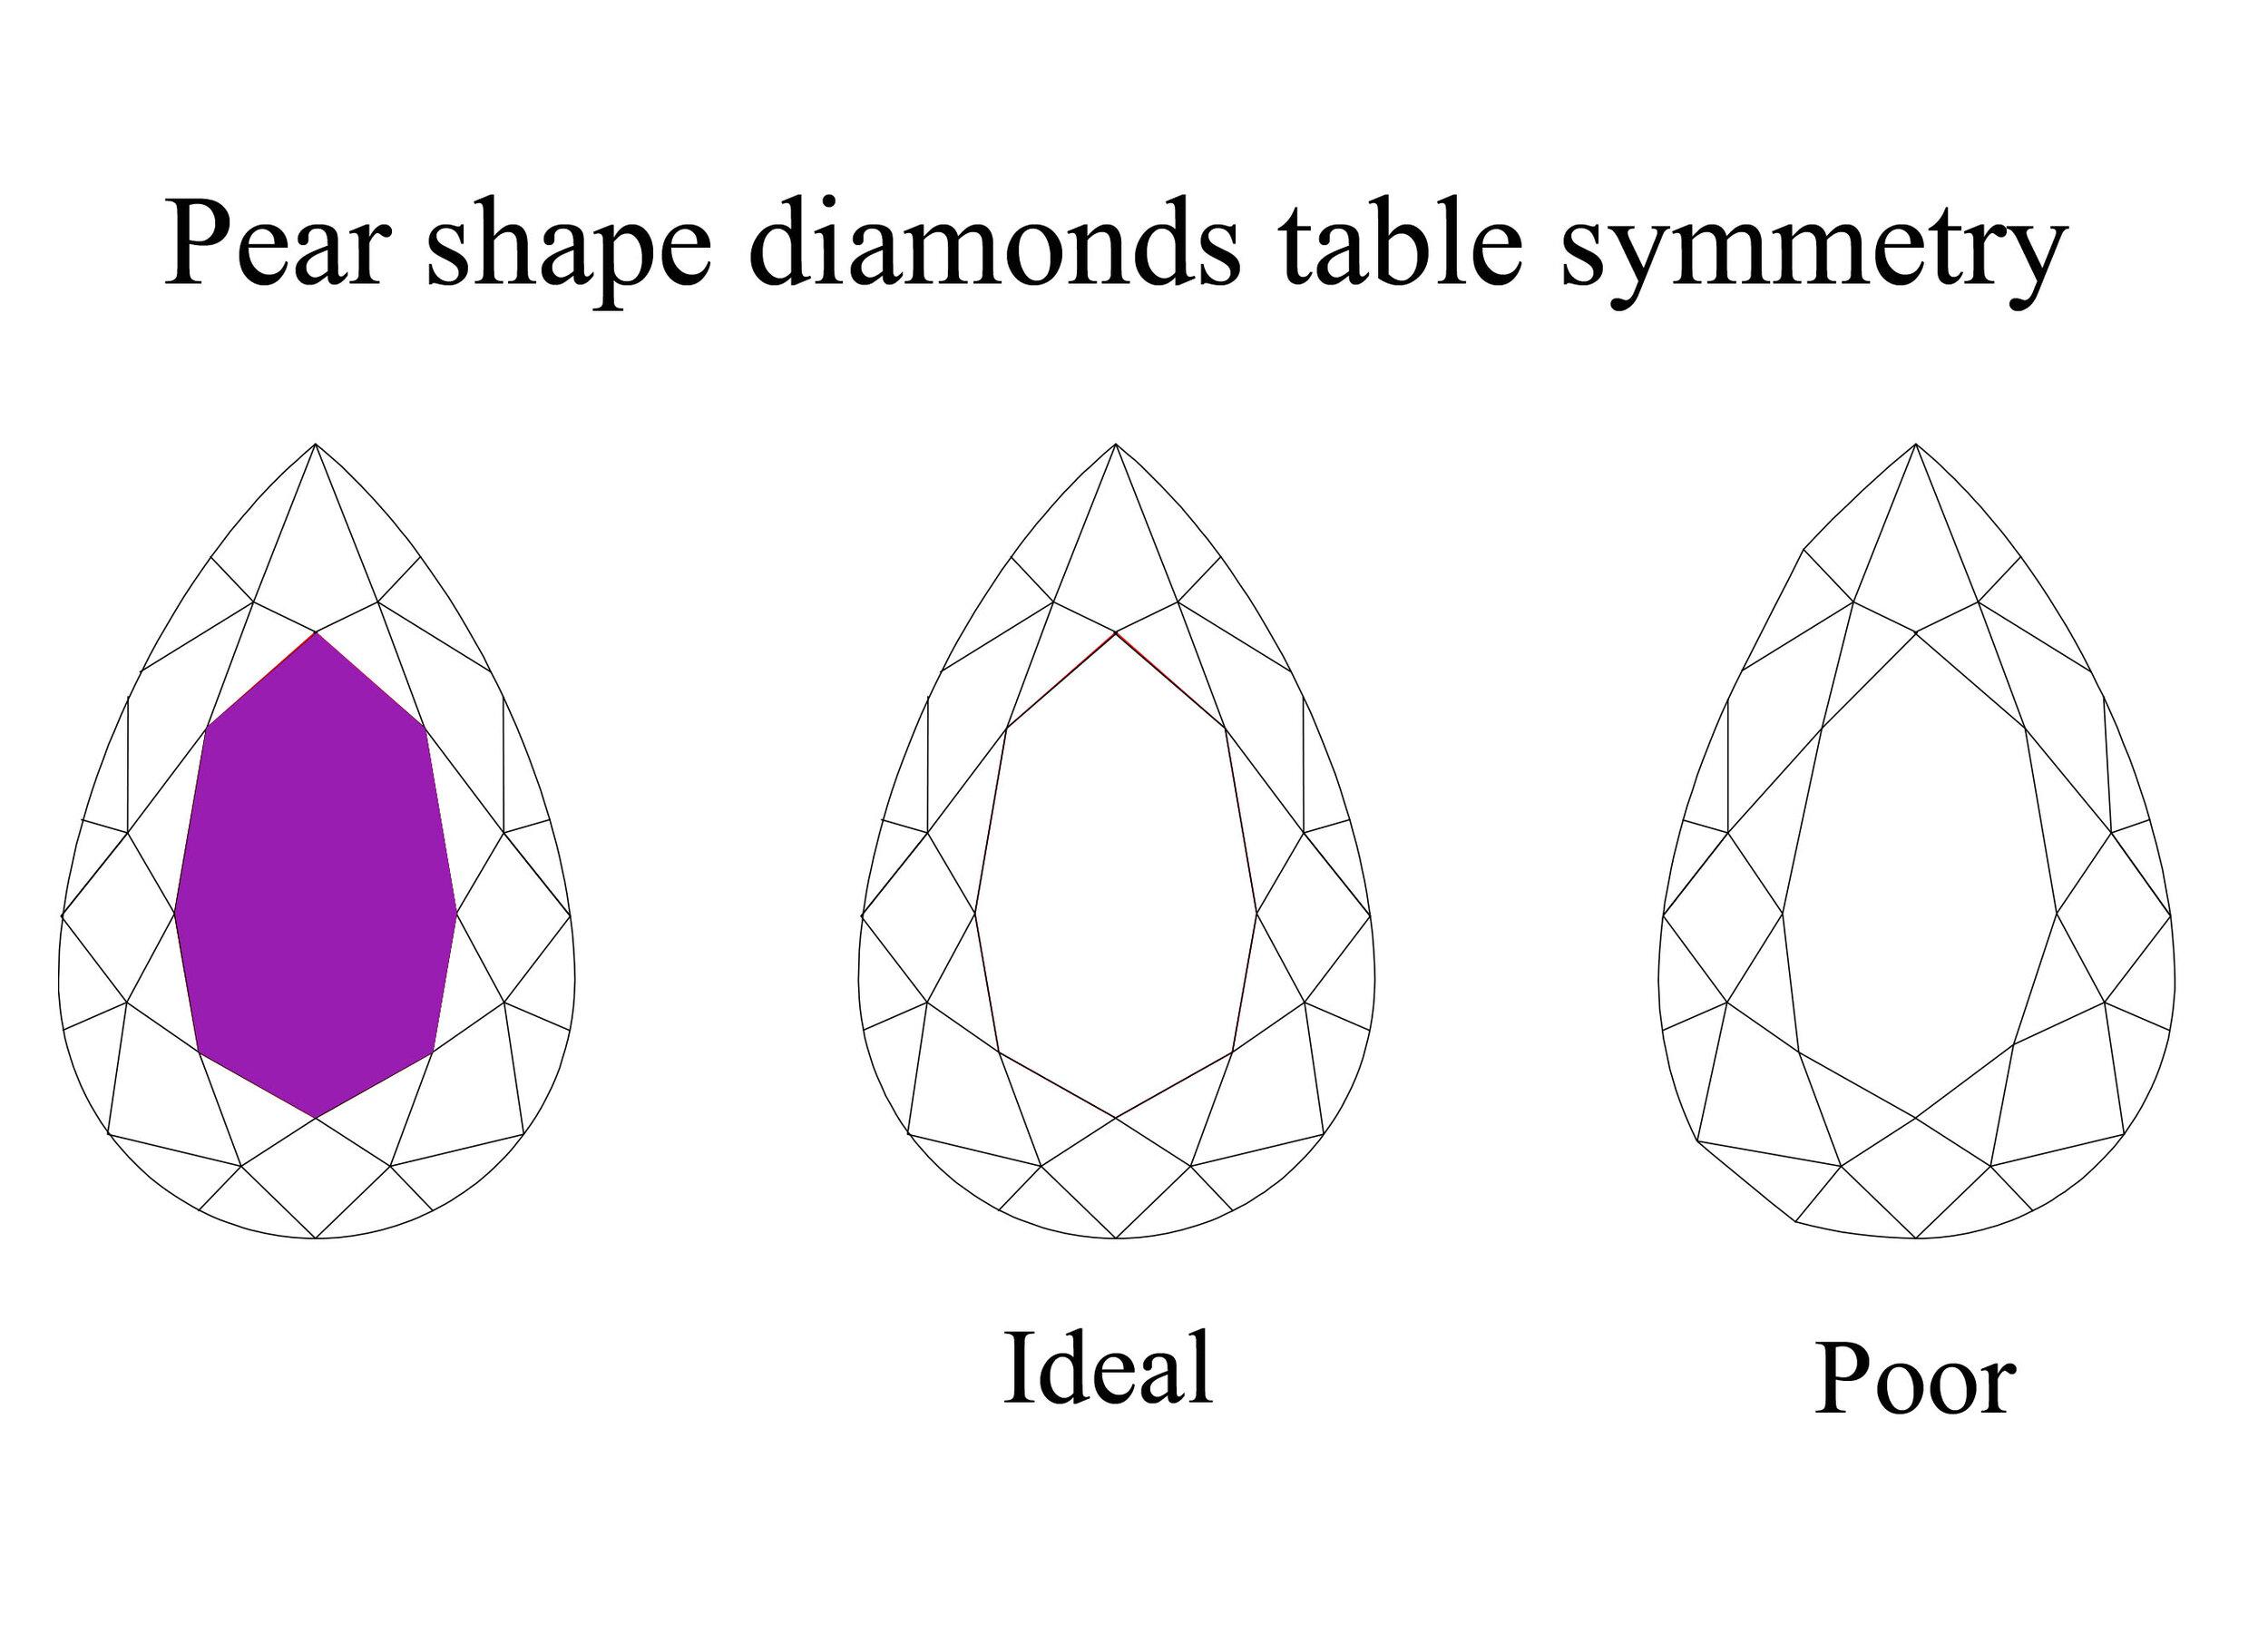 Pear shape diamond table symmetry.jpg